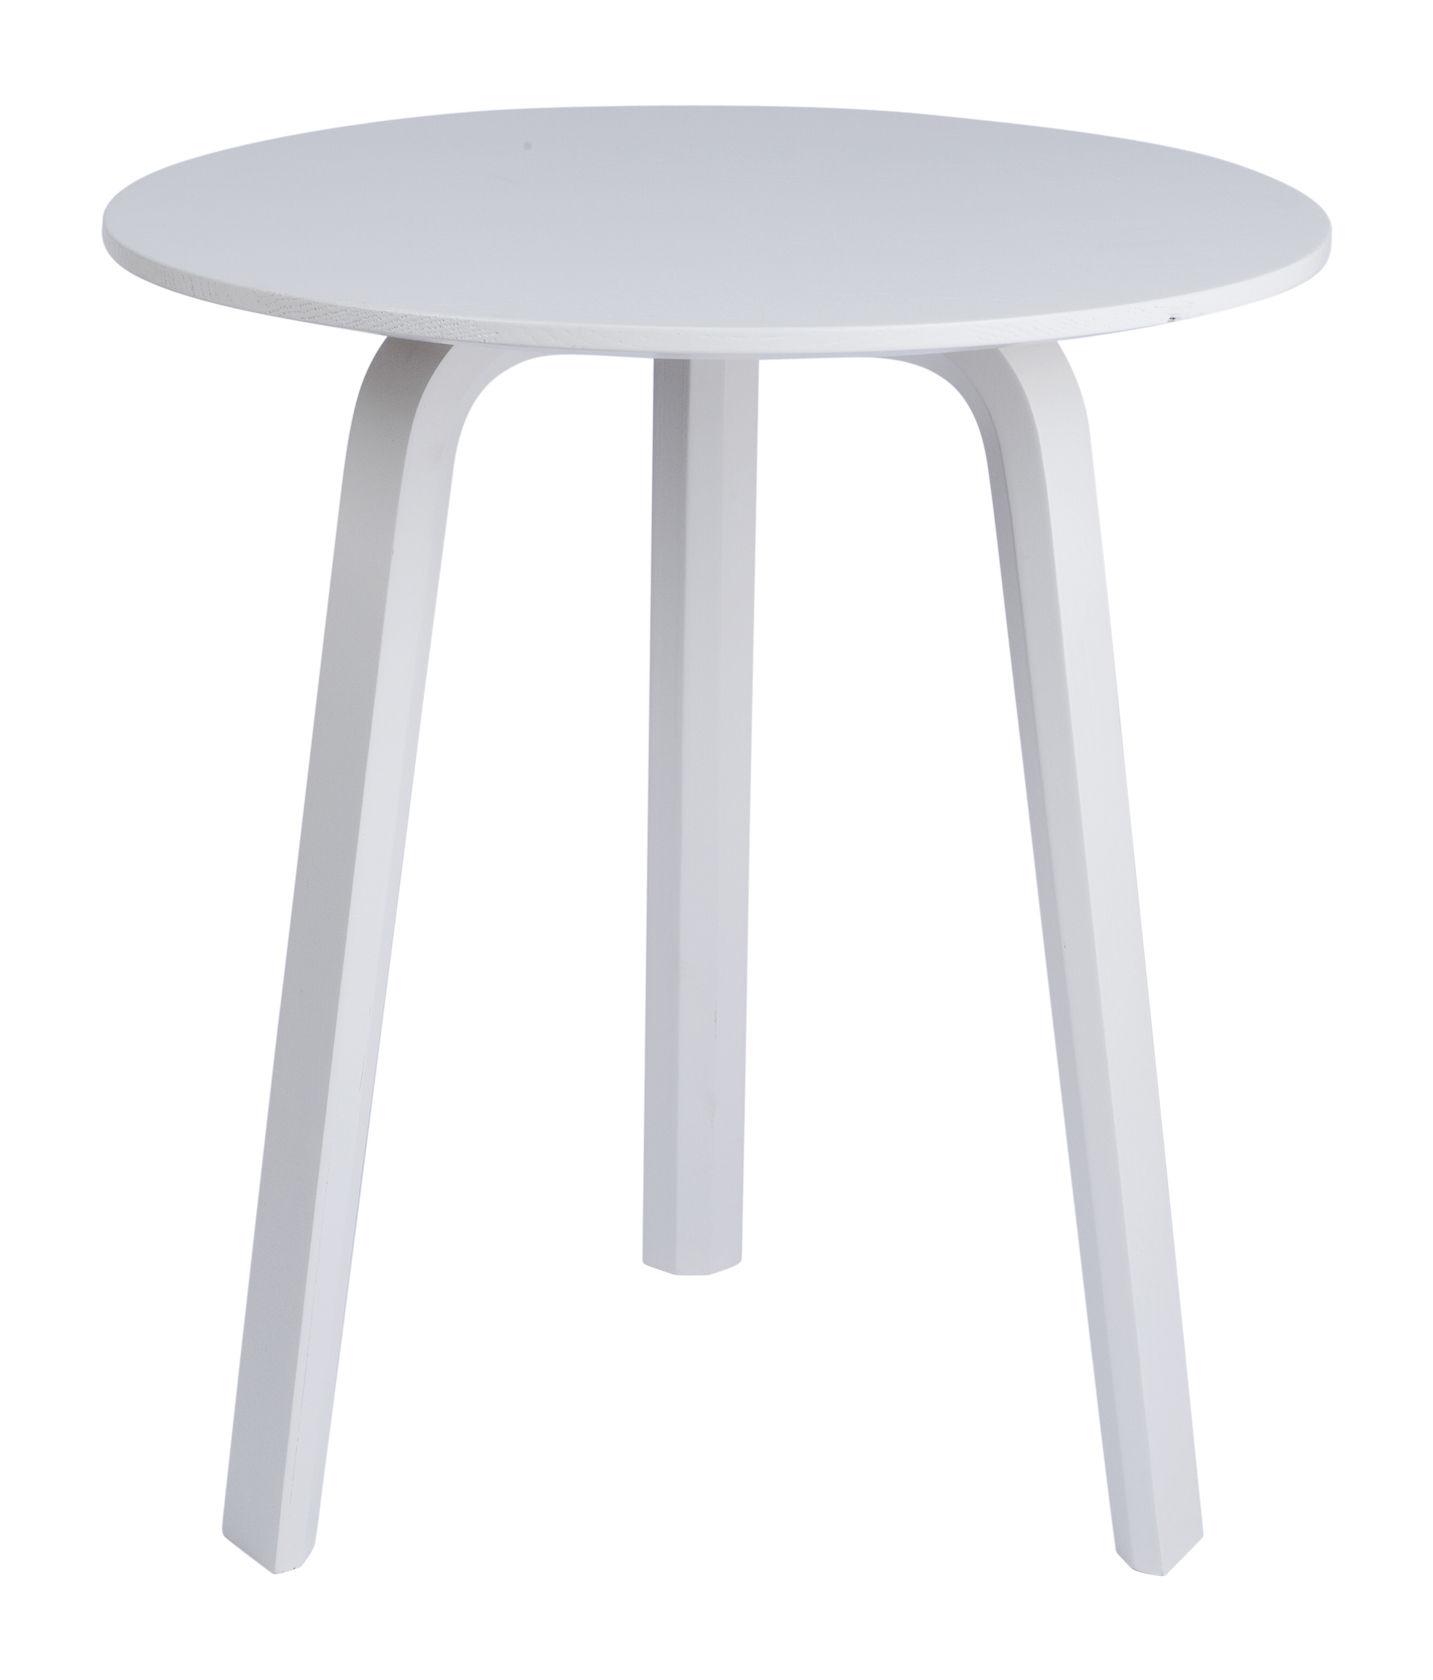 table basse bella 45 x h 49 cm blanc hay. Black Bedroom Furniture Sets. Home Design Ideas